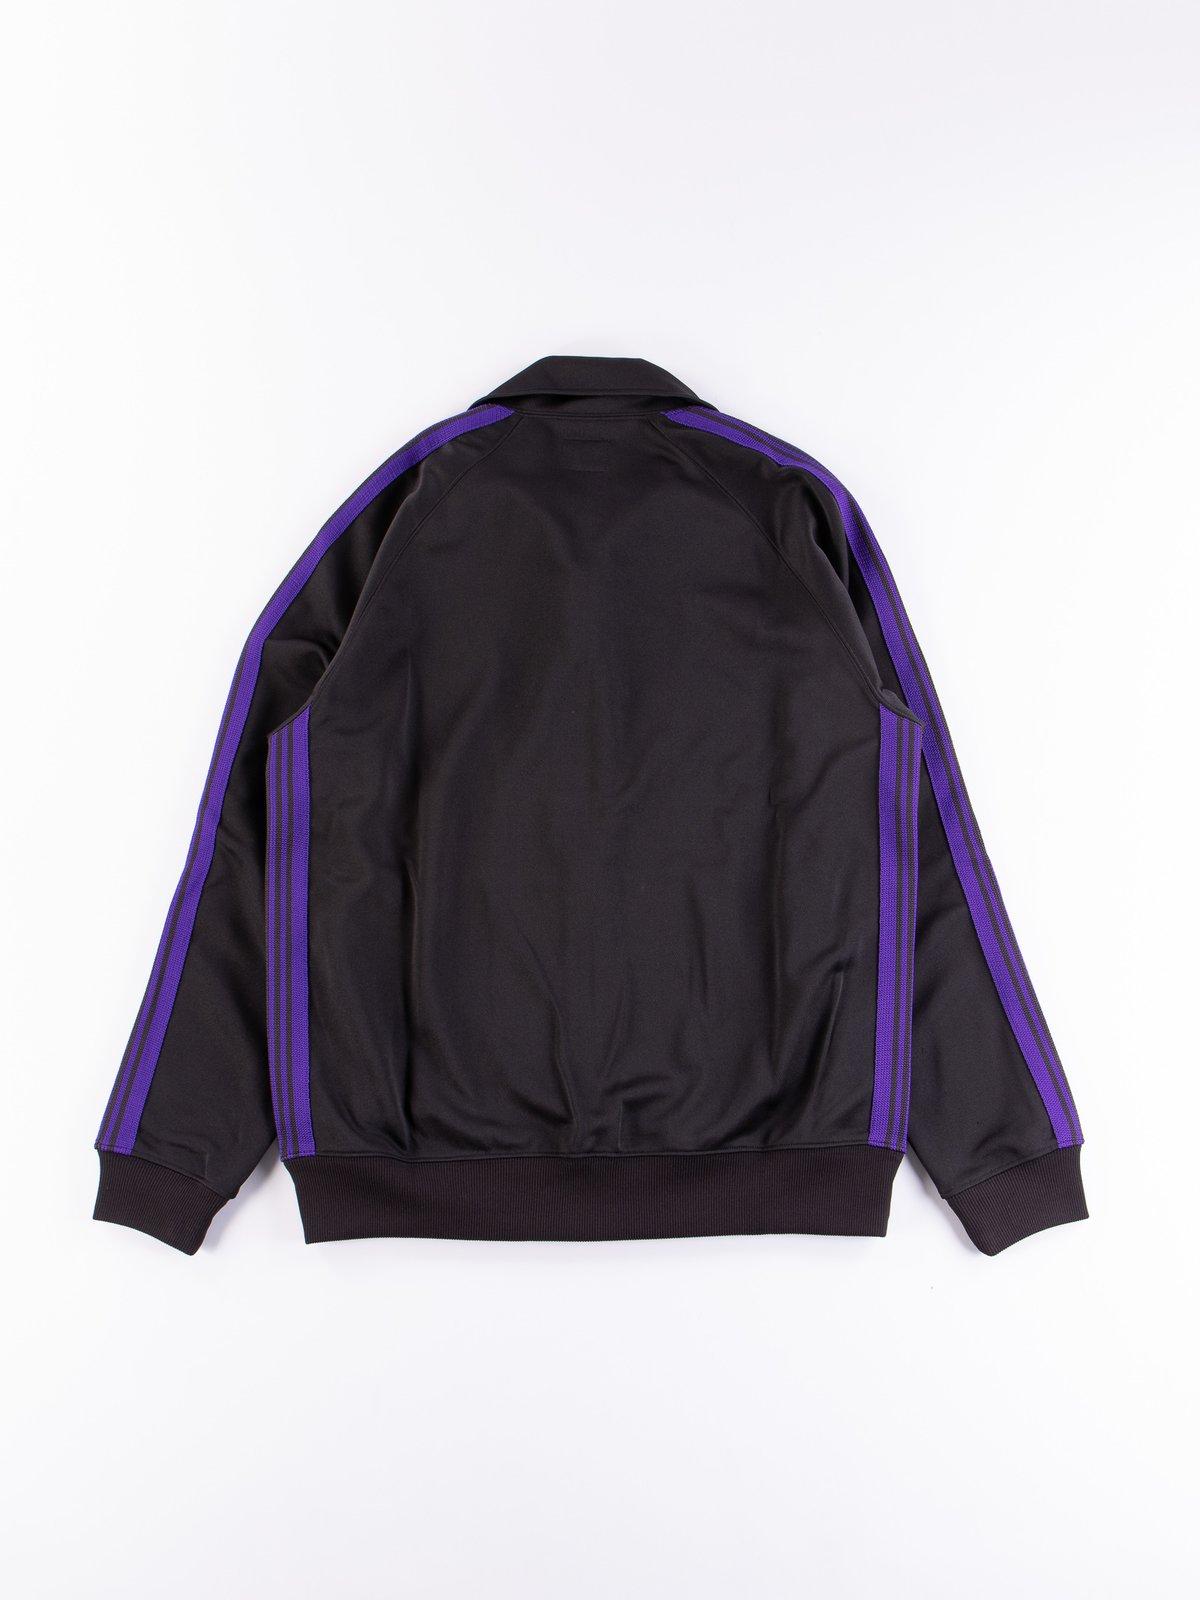 Charcoal Track Jacket - Image 5